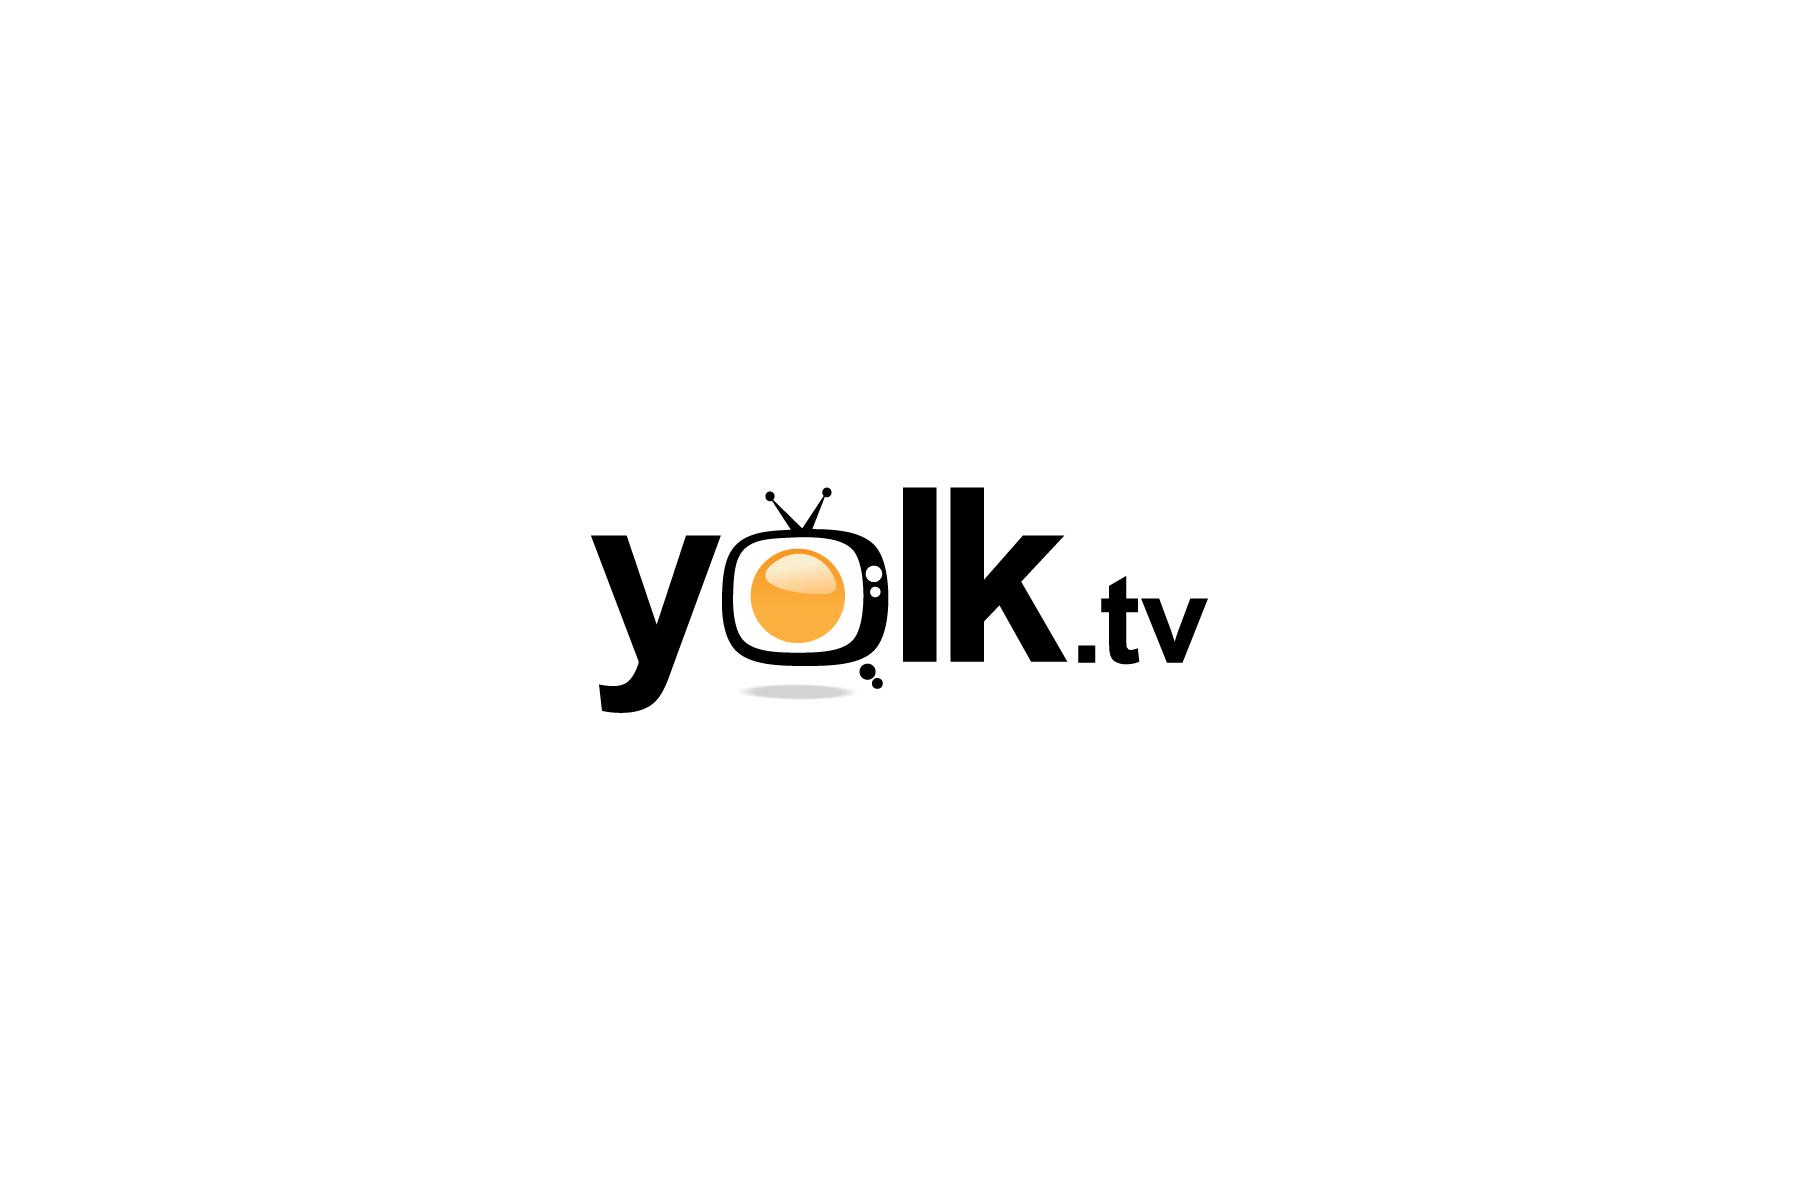 Create the next logo for yolk.tv